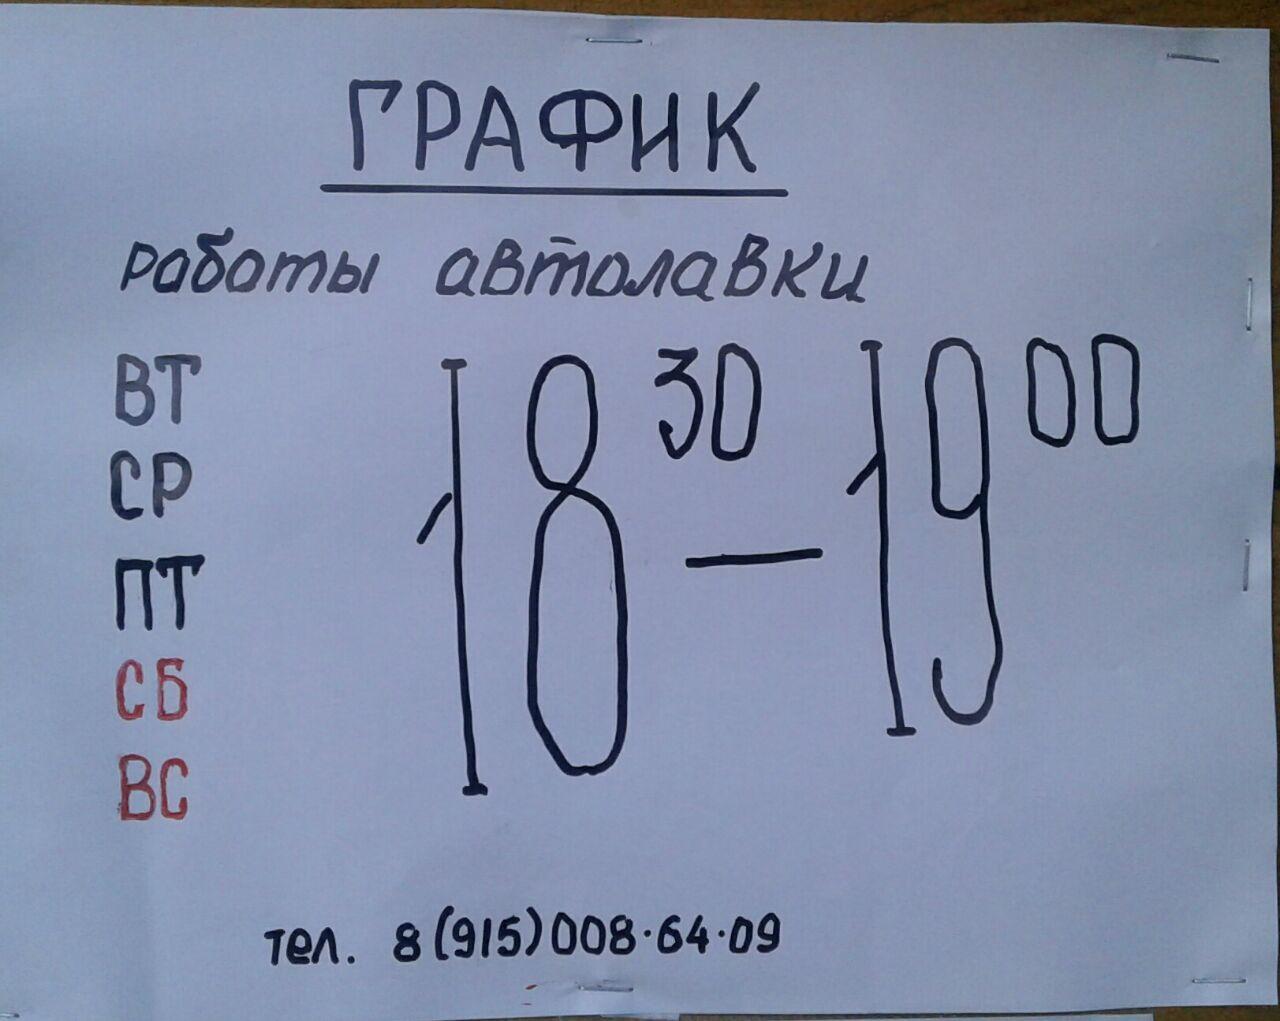 pp.userapi.com/c849428/v849428566/2595d/tG3zJ1OVobo.jpg